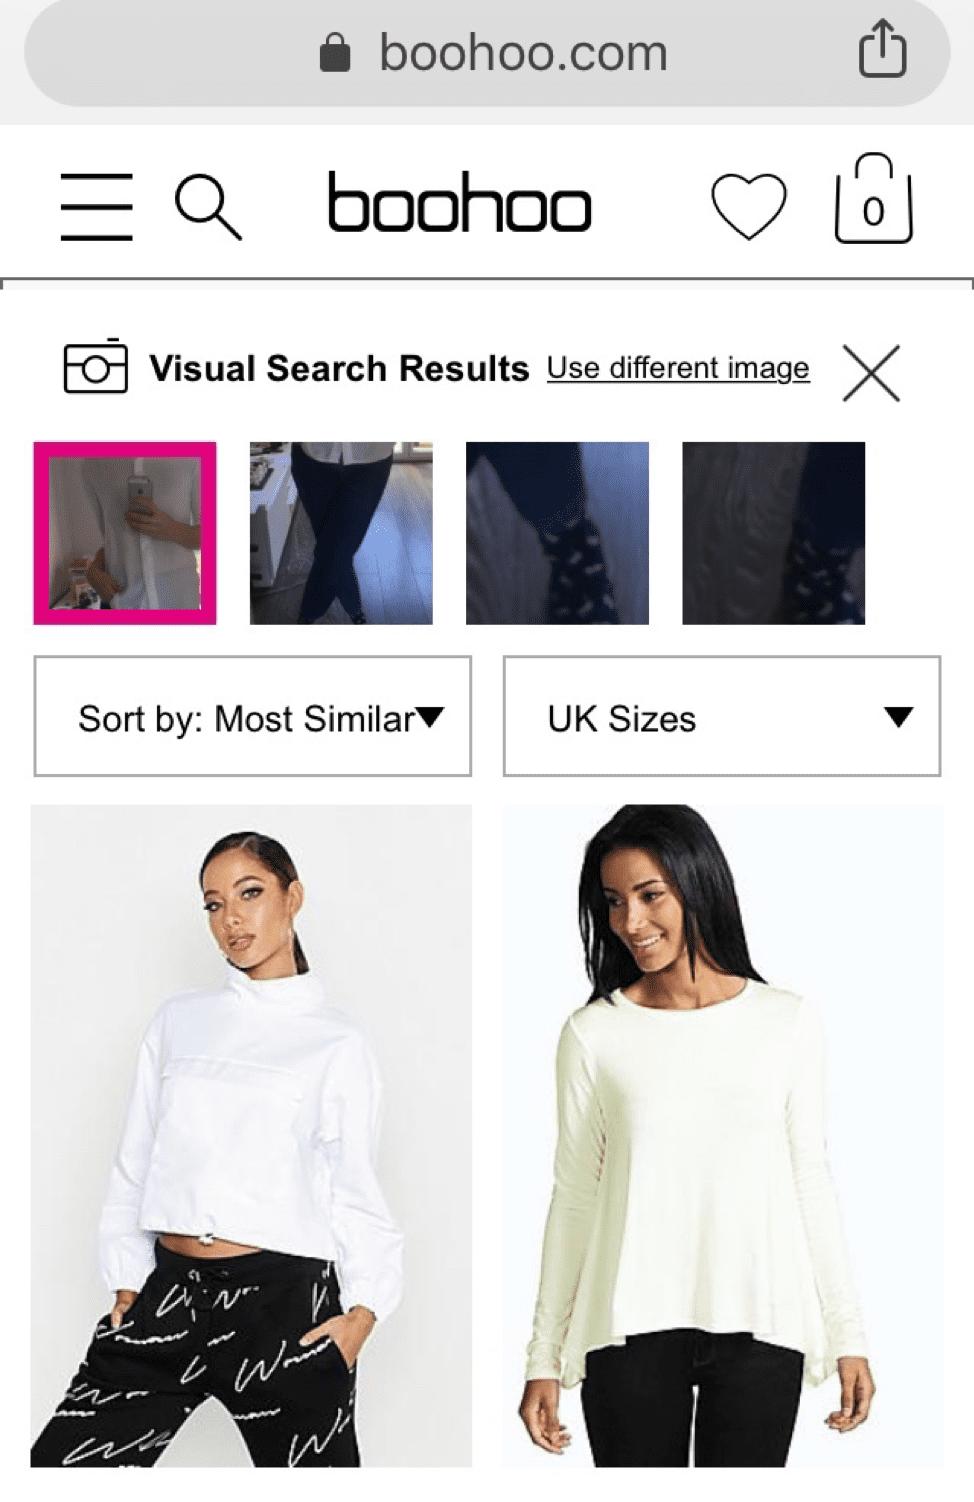 boohoo visual search results